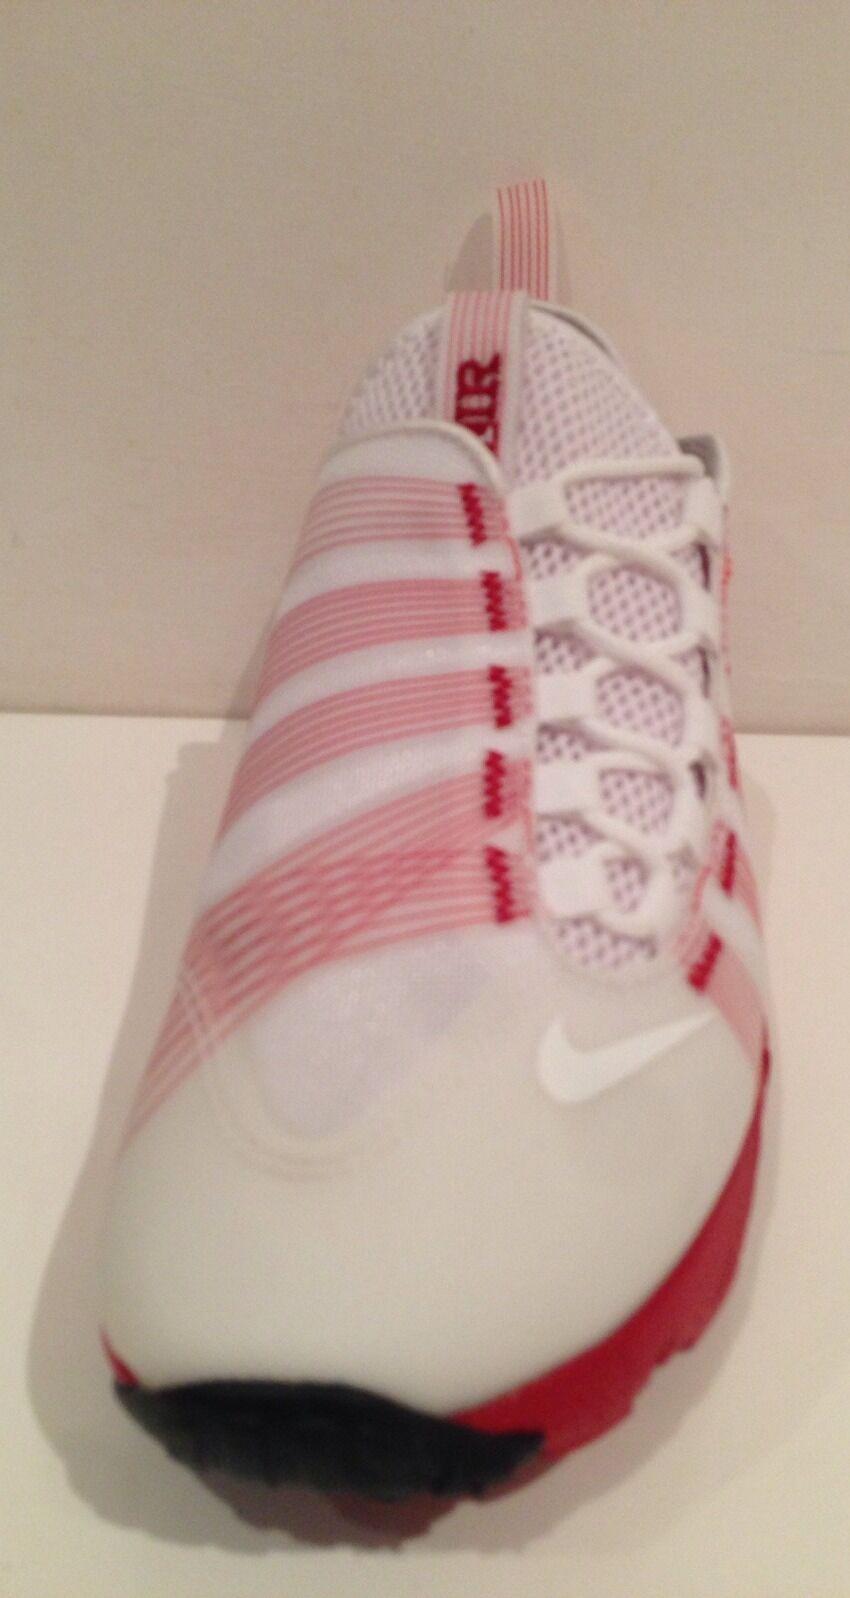 Nike Air The Footscape Motion 'Year Of The Air Dragon' Größe 6 (uk) BNIB 31c684